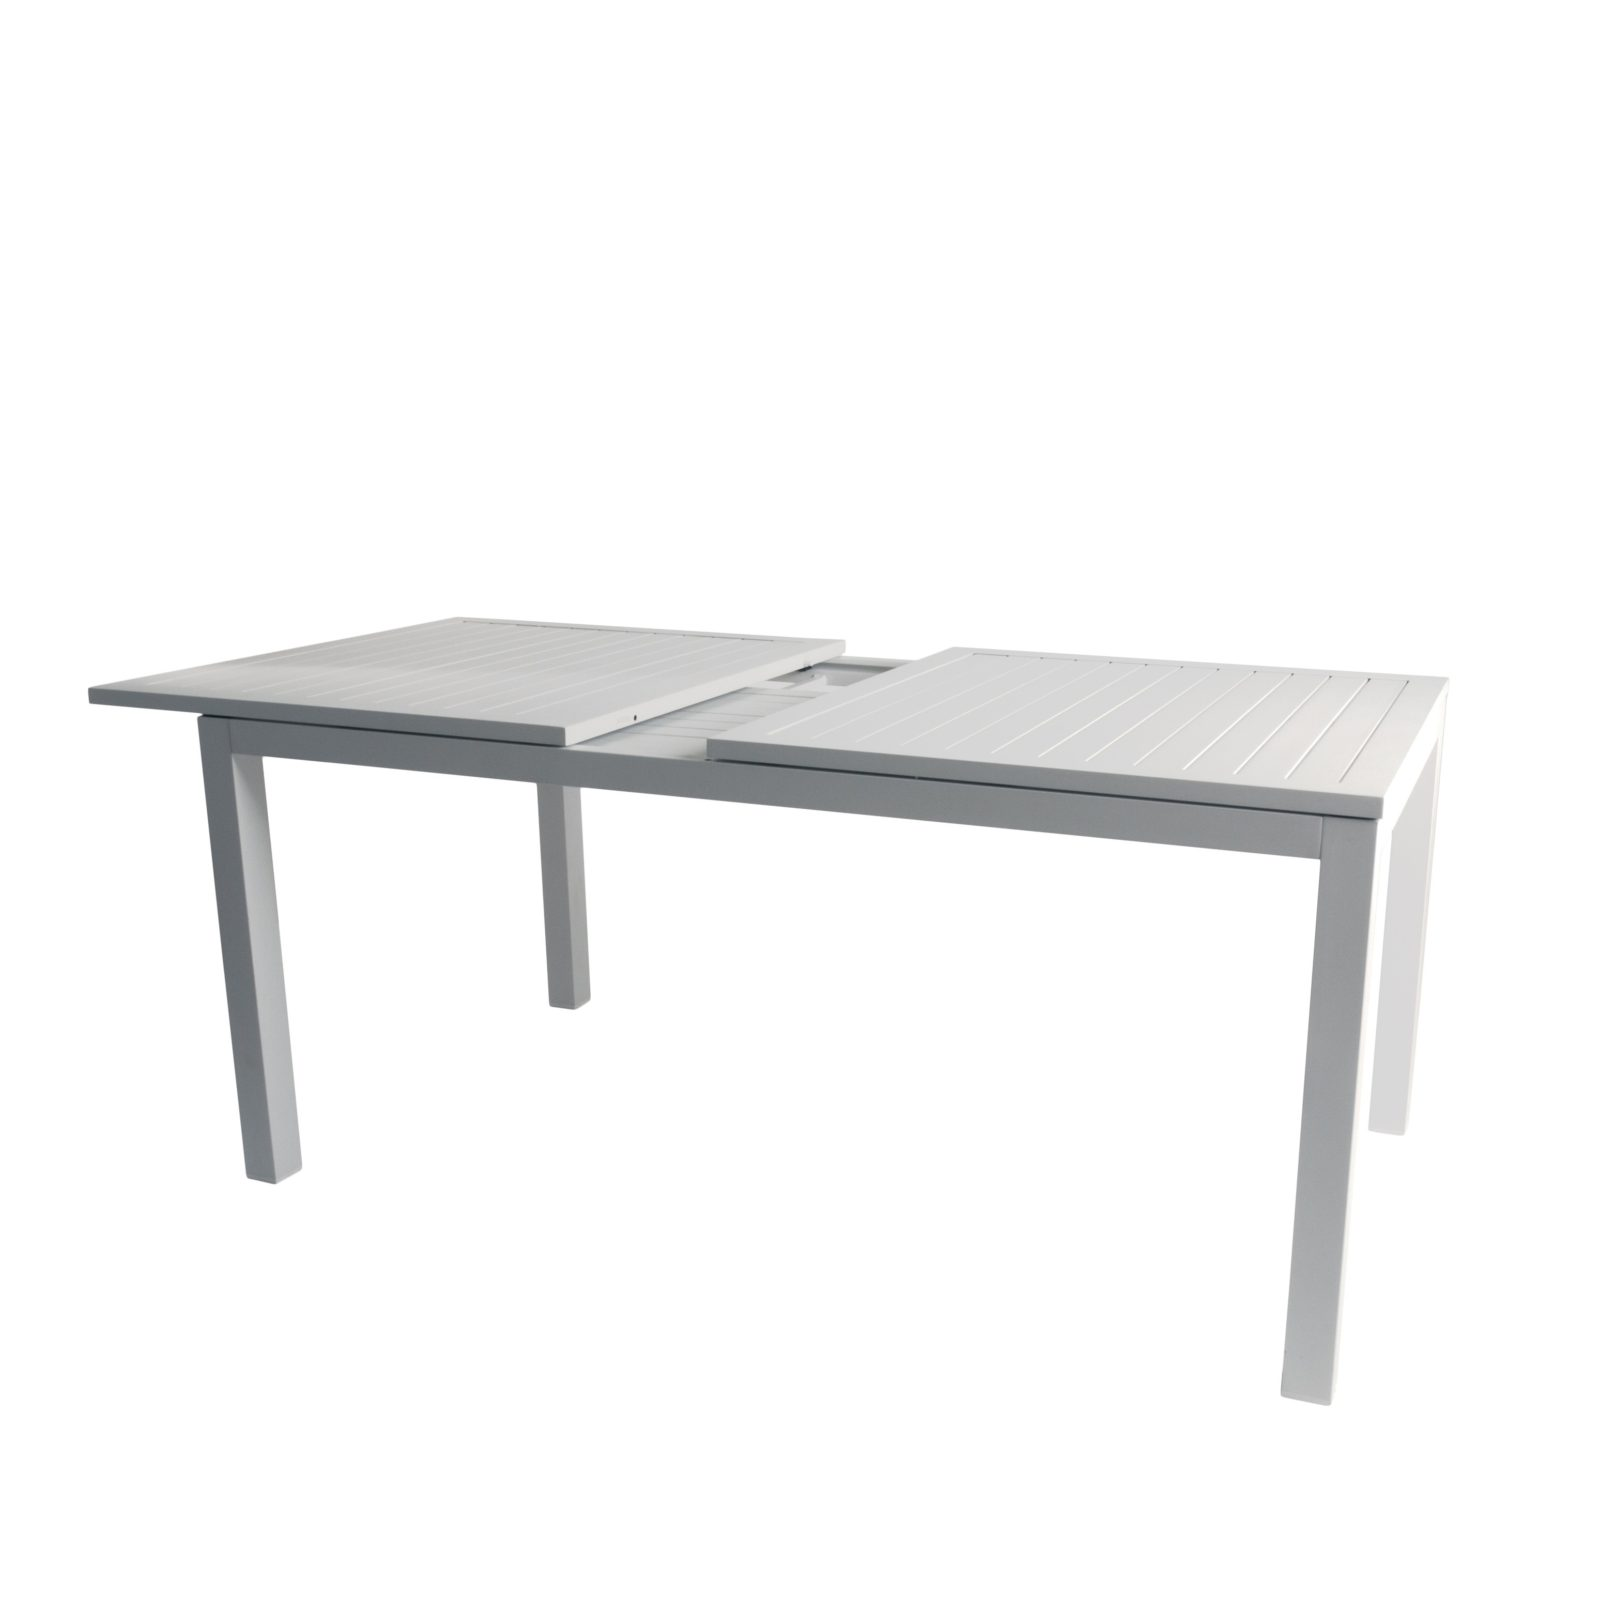 Lafayette udtræksbord aluminium 218x90 cm 65881003